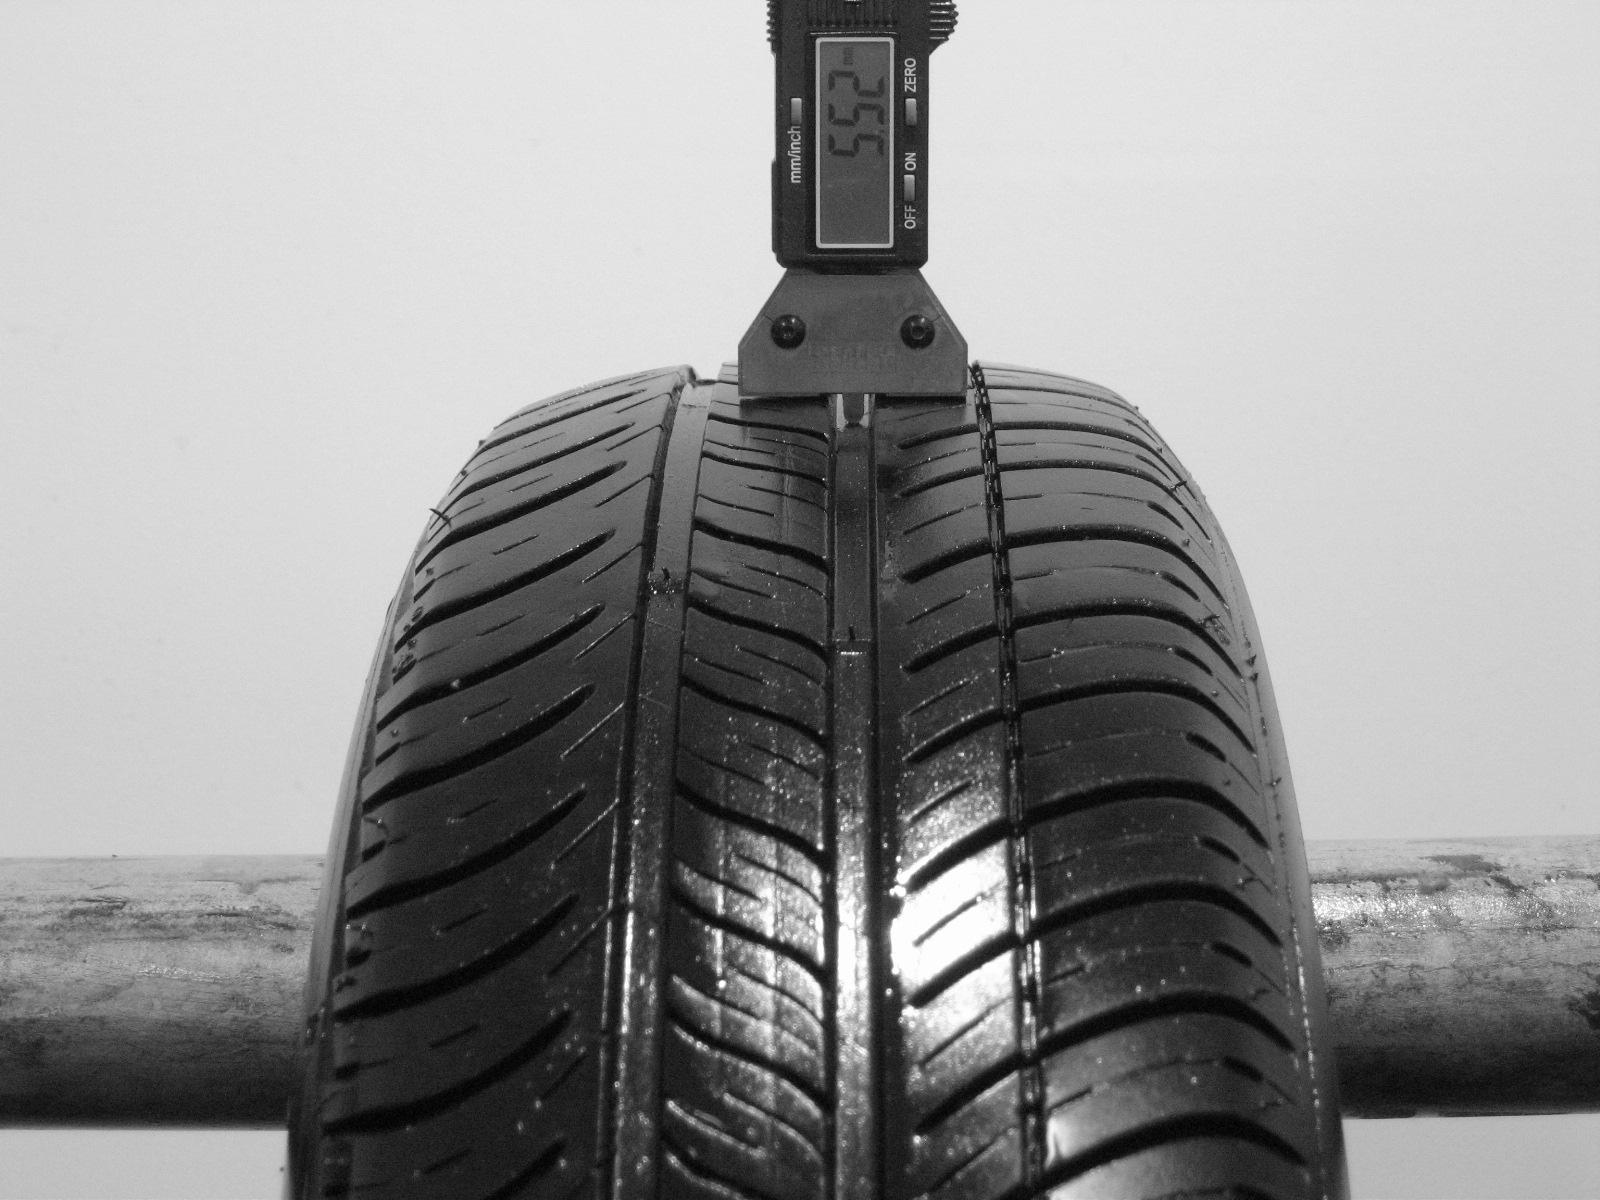 Použité-Pneu-Bazar - 165/65 R14 MICHELIN ENERGY E3A-kusovka-rezerva 3mm